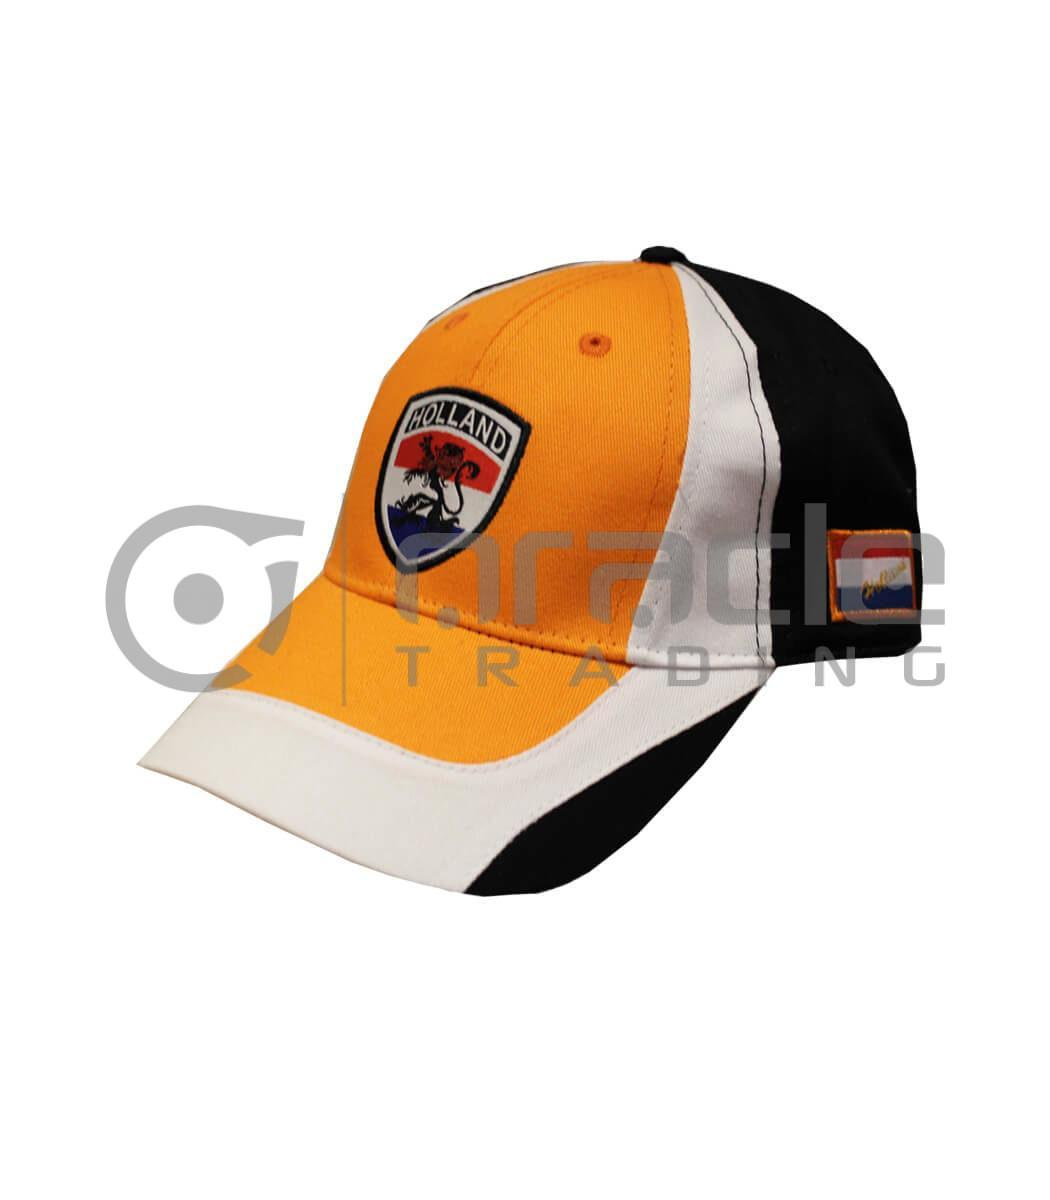 Holland Classic Hat